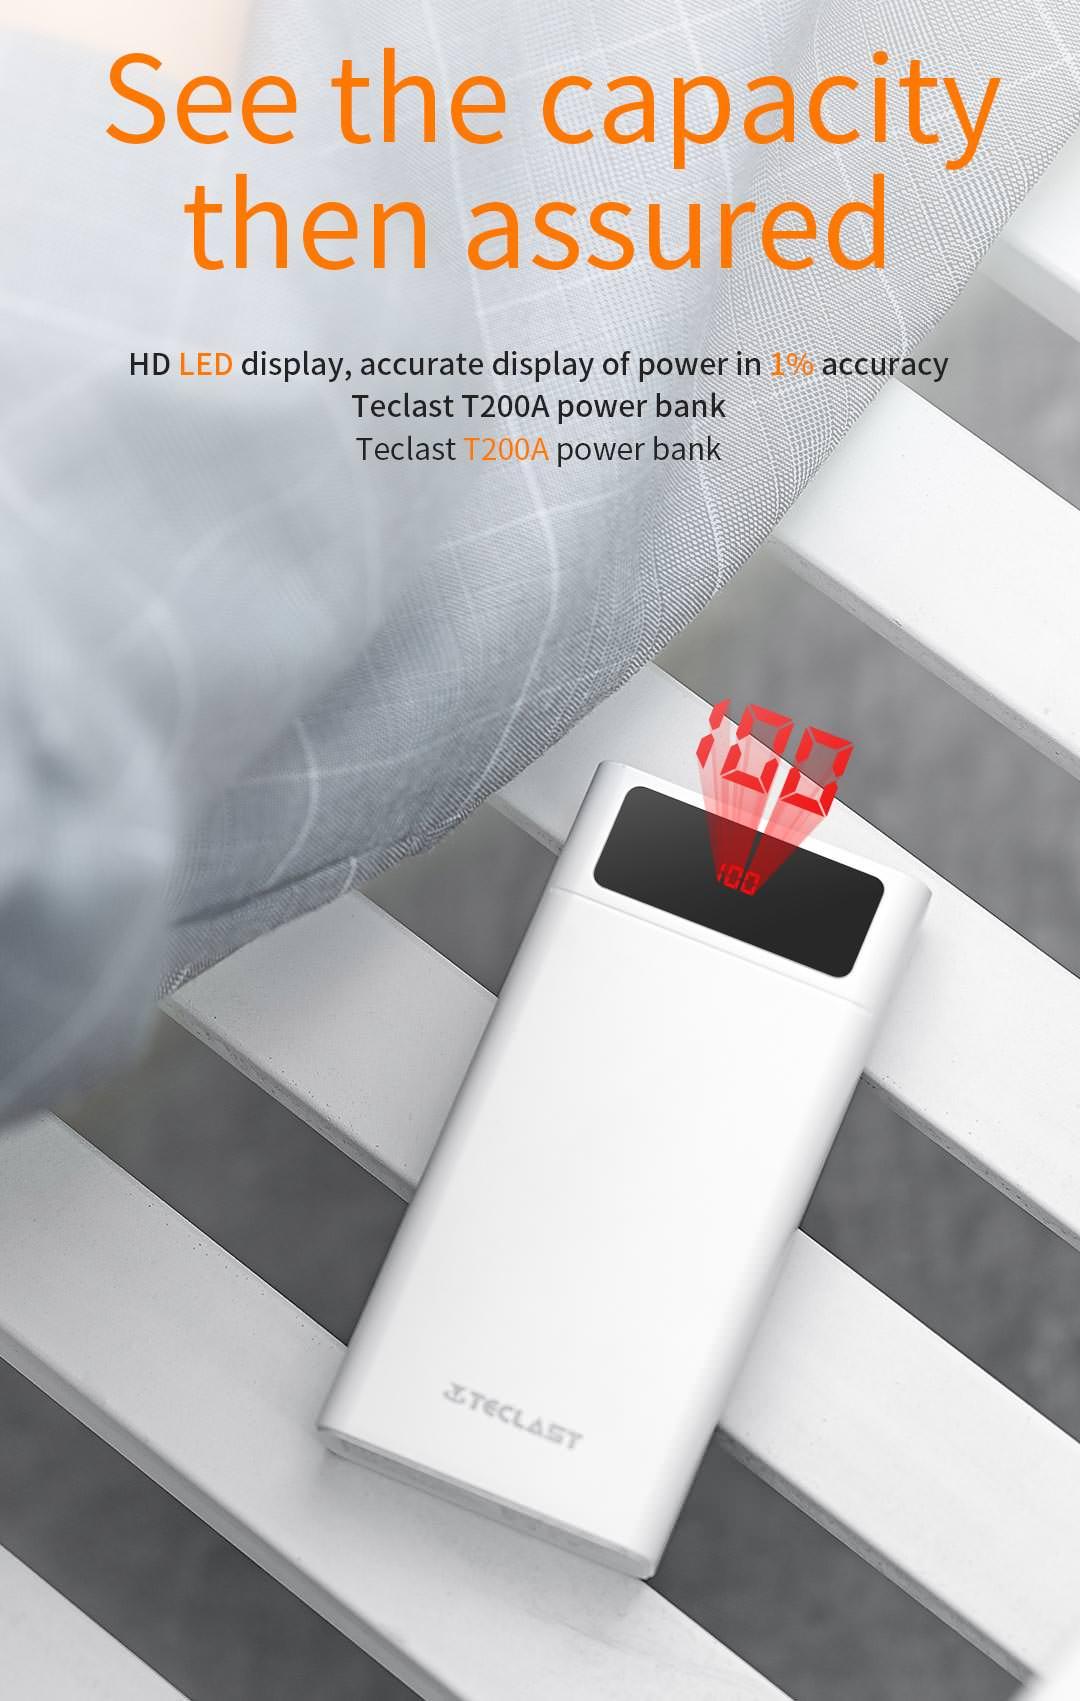 new teclast t200a power bank